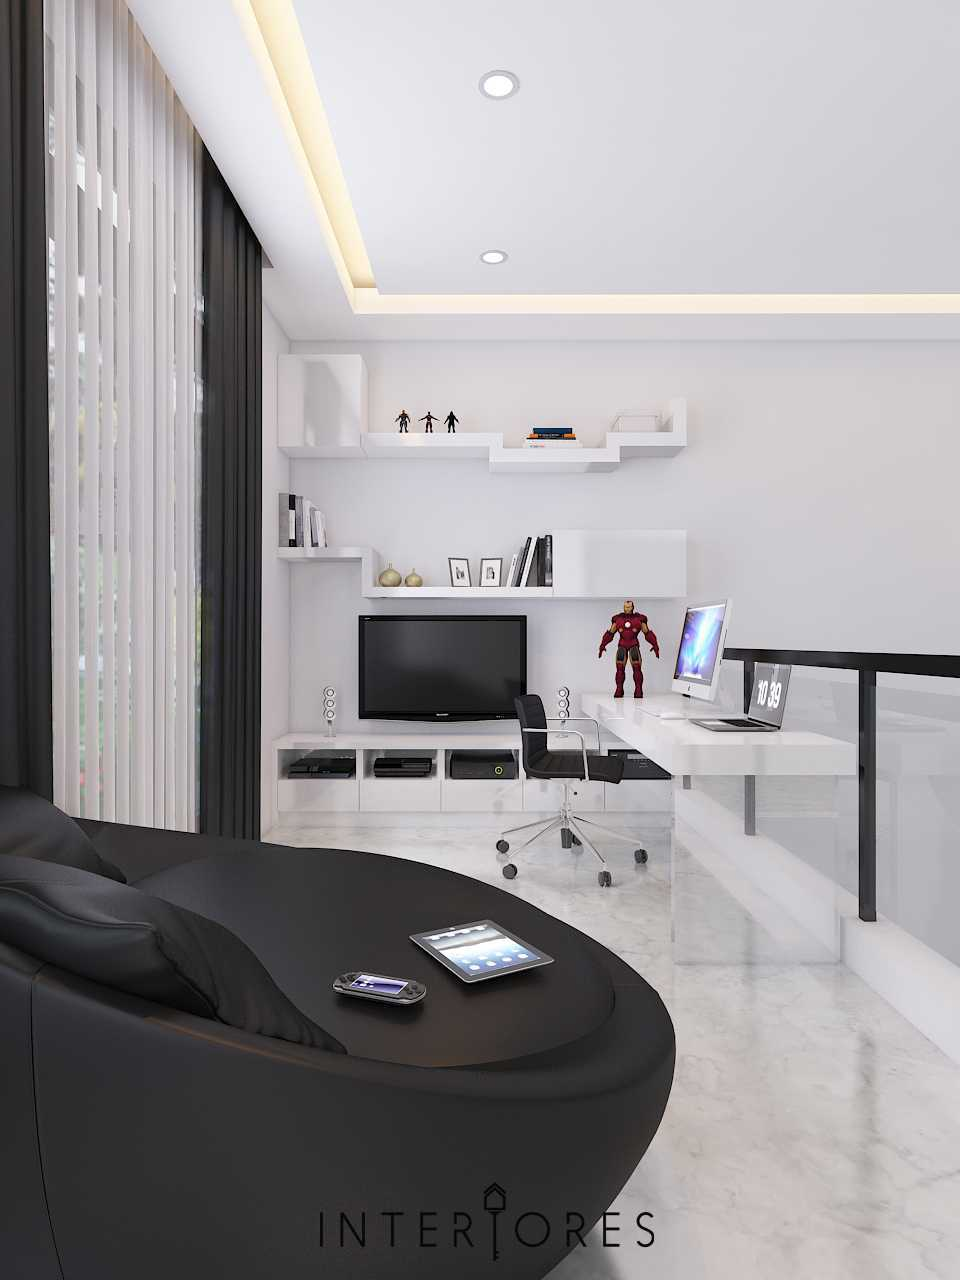 Interiores Interior Consultant & Build Sutera Onyx Alam Sutera Alam Sutera Ruang-Game Modern  17720